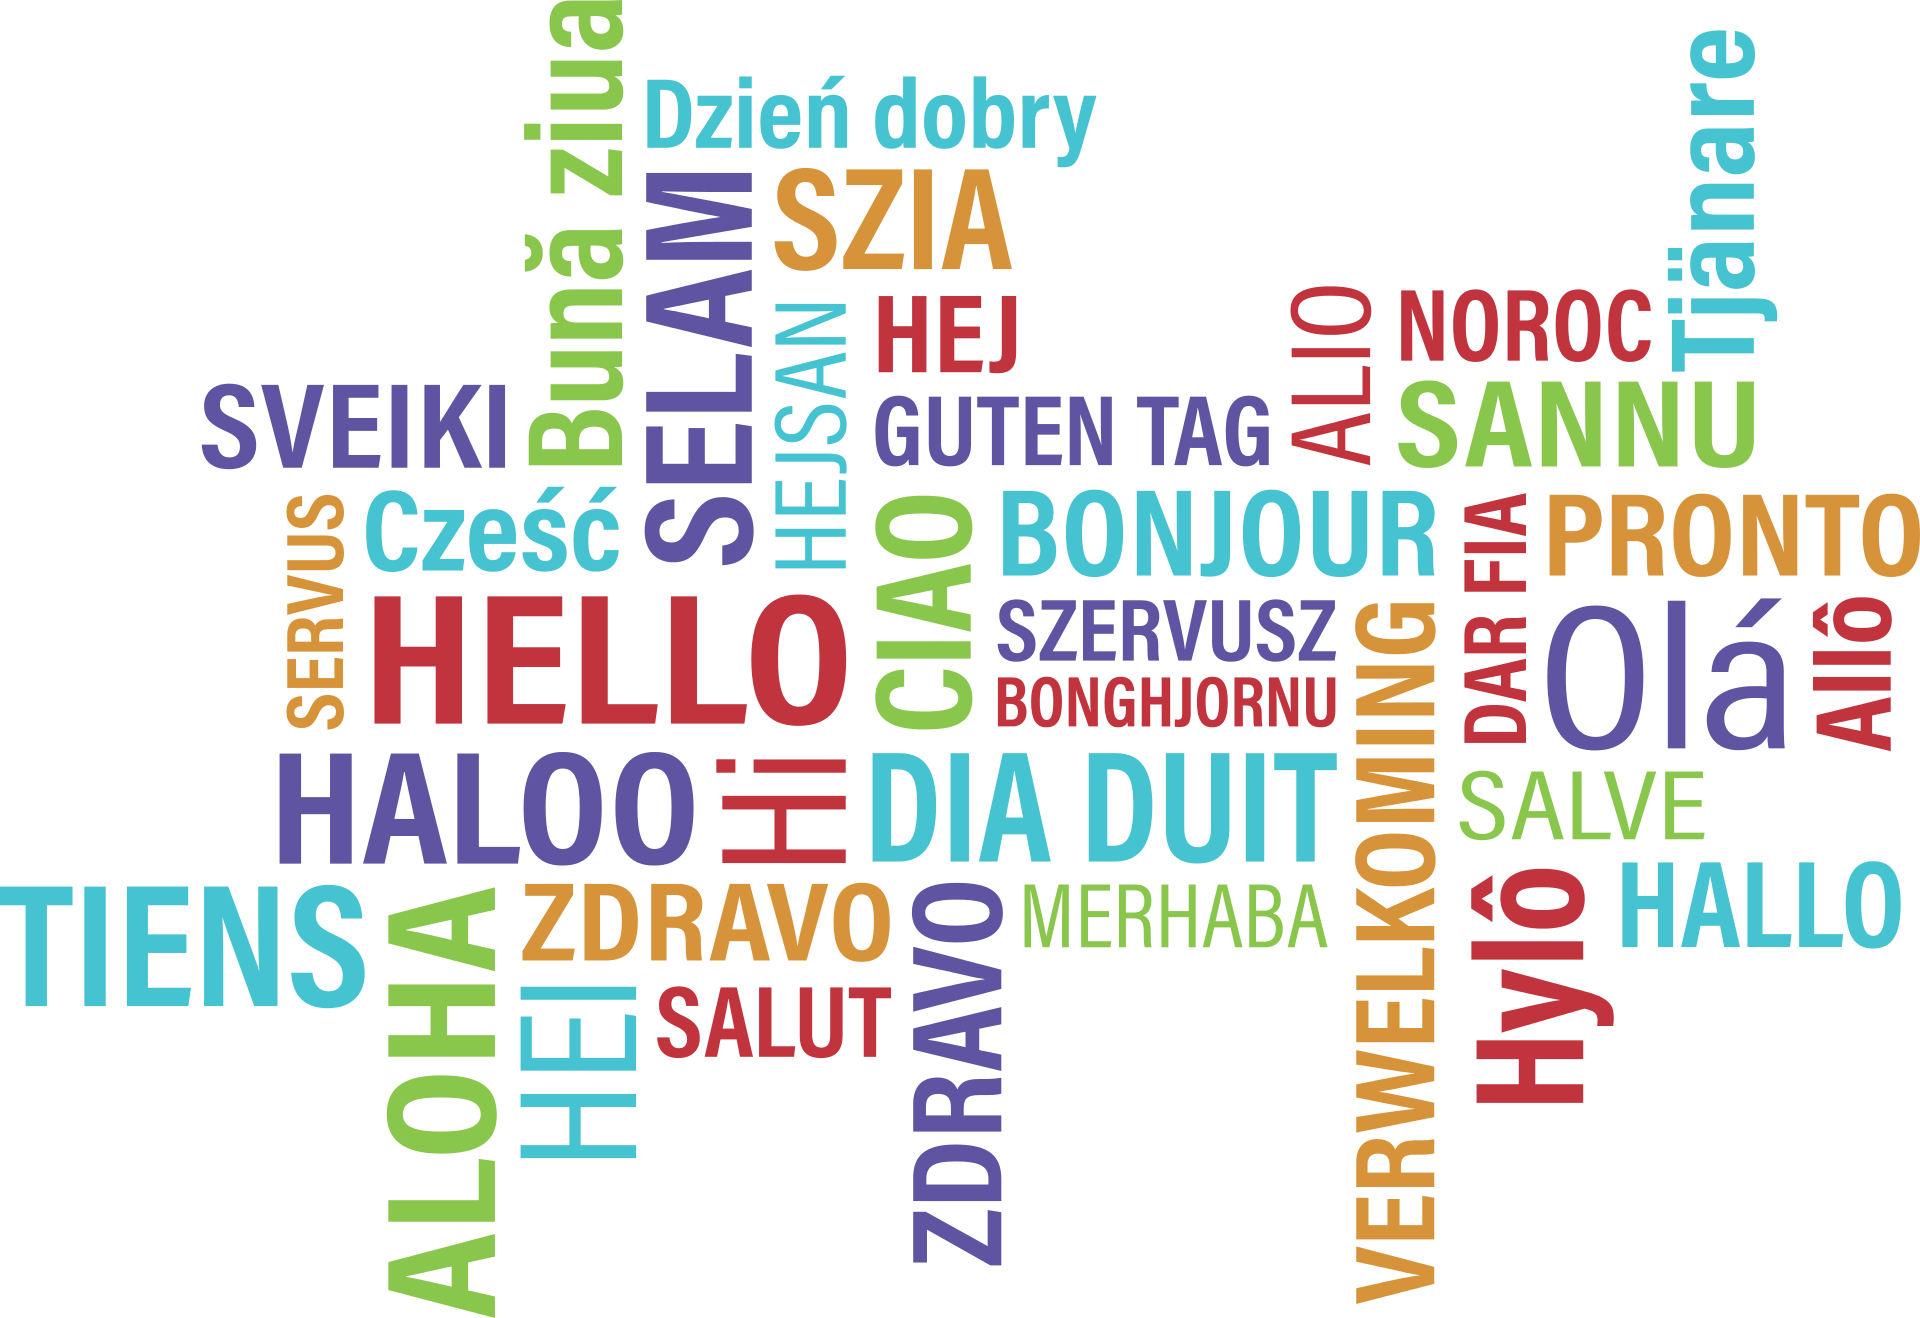 Speak basic German